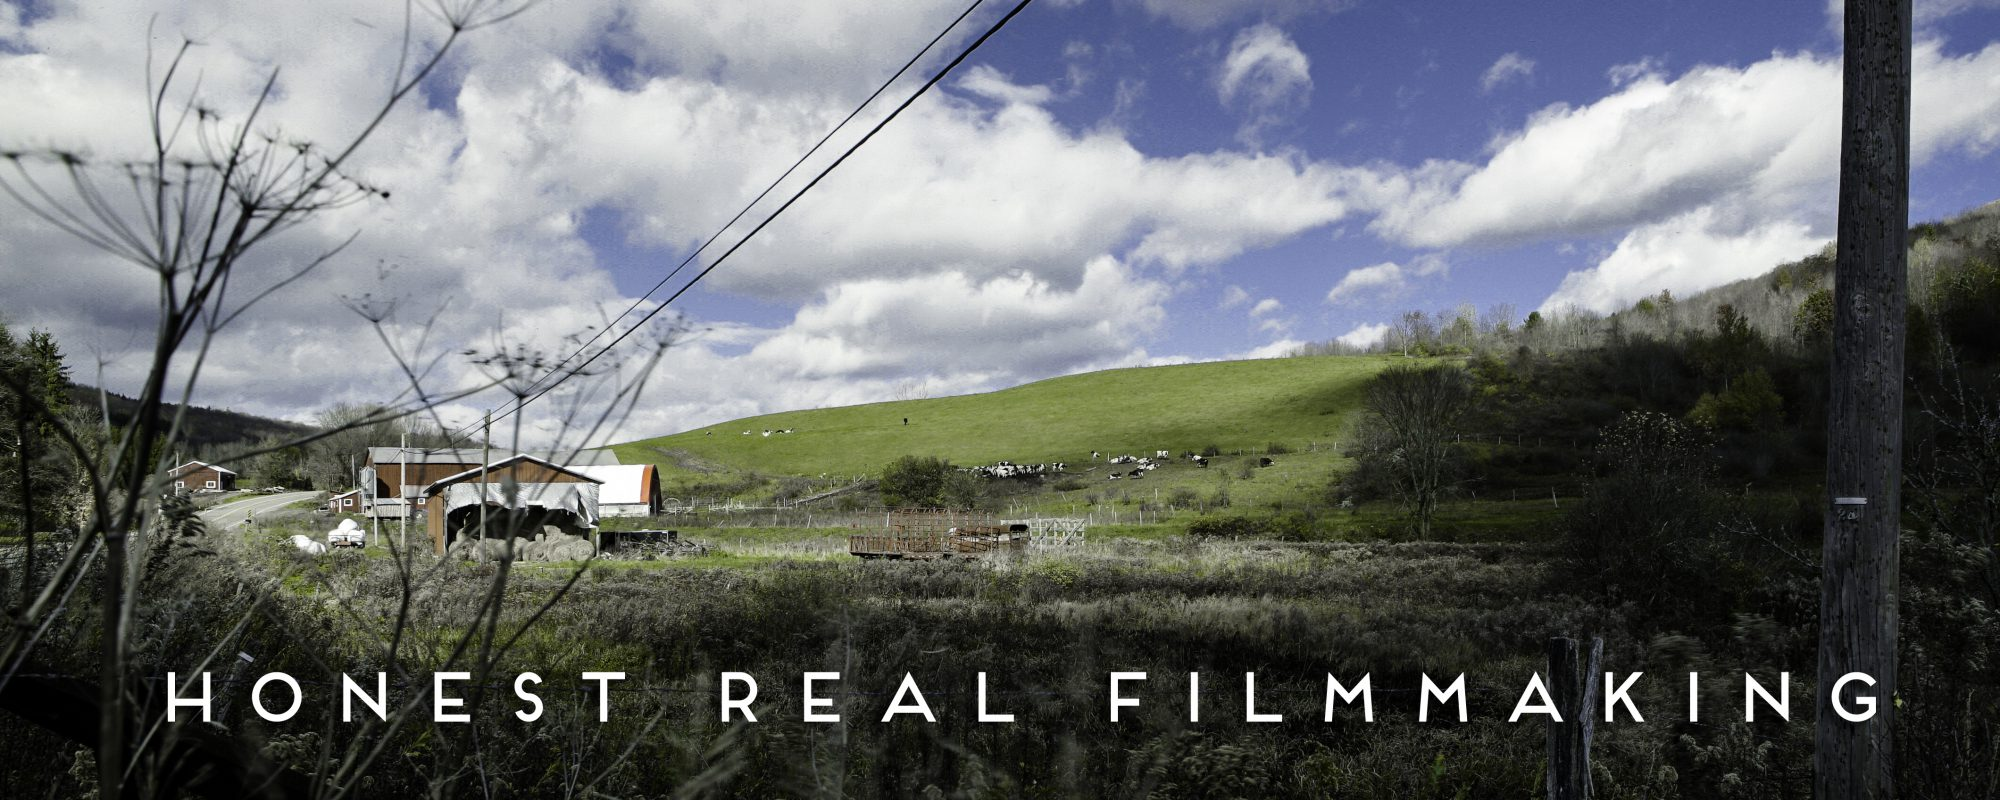 Honest Real Filmmaking